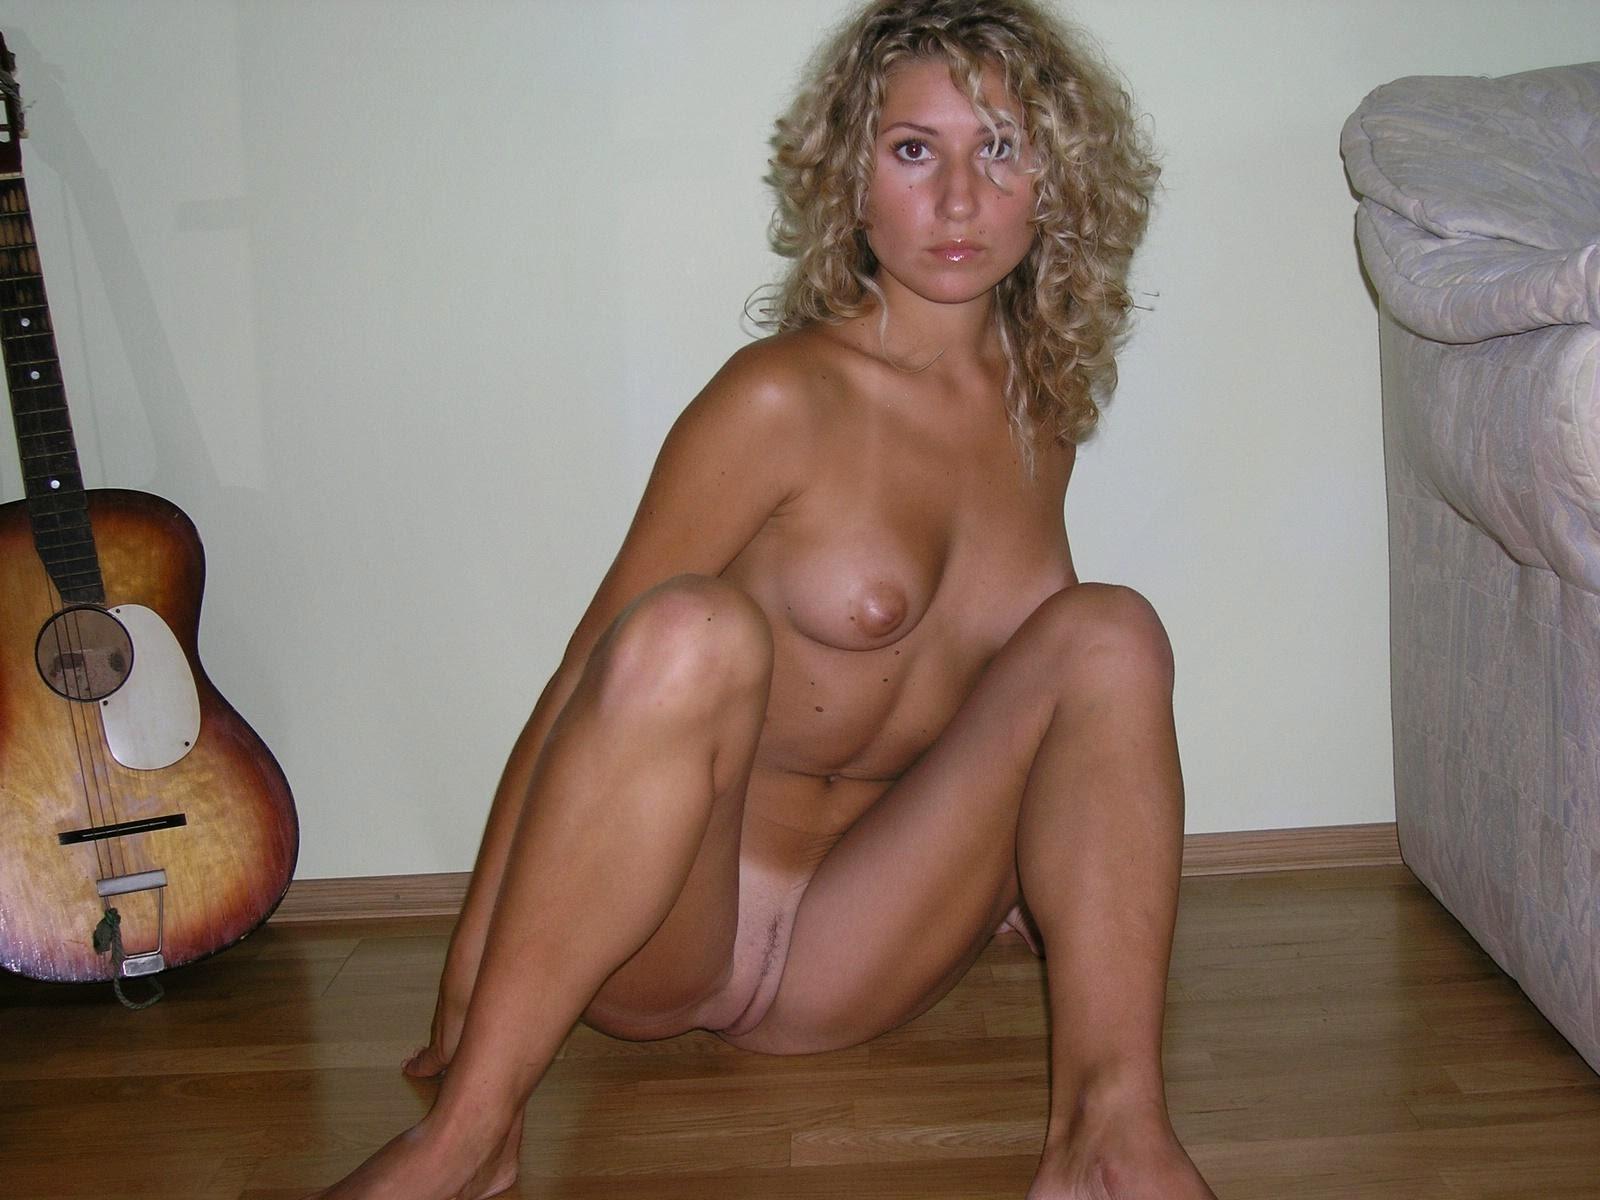 "кучерявые порно фото  фото 15""></img><br></div> <div class=""foto_gallery""><img src=""http://i1.perdos.info/files/photo/2015/04/P3529/P3529_perdos.ru_4.jpg"" width=""500"" alt="